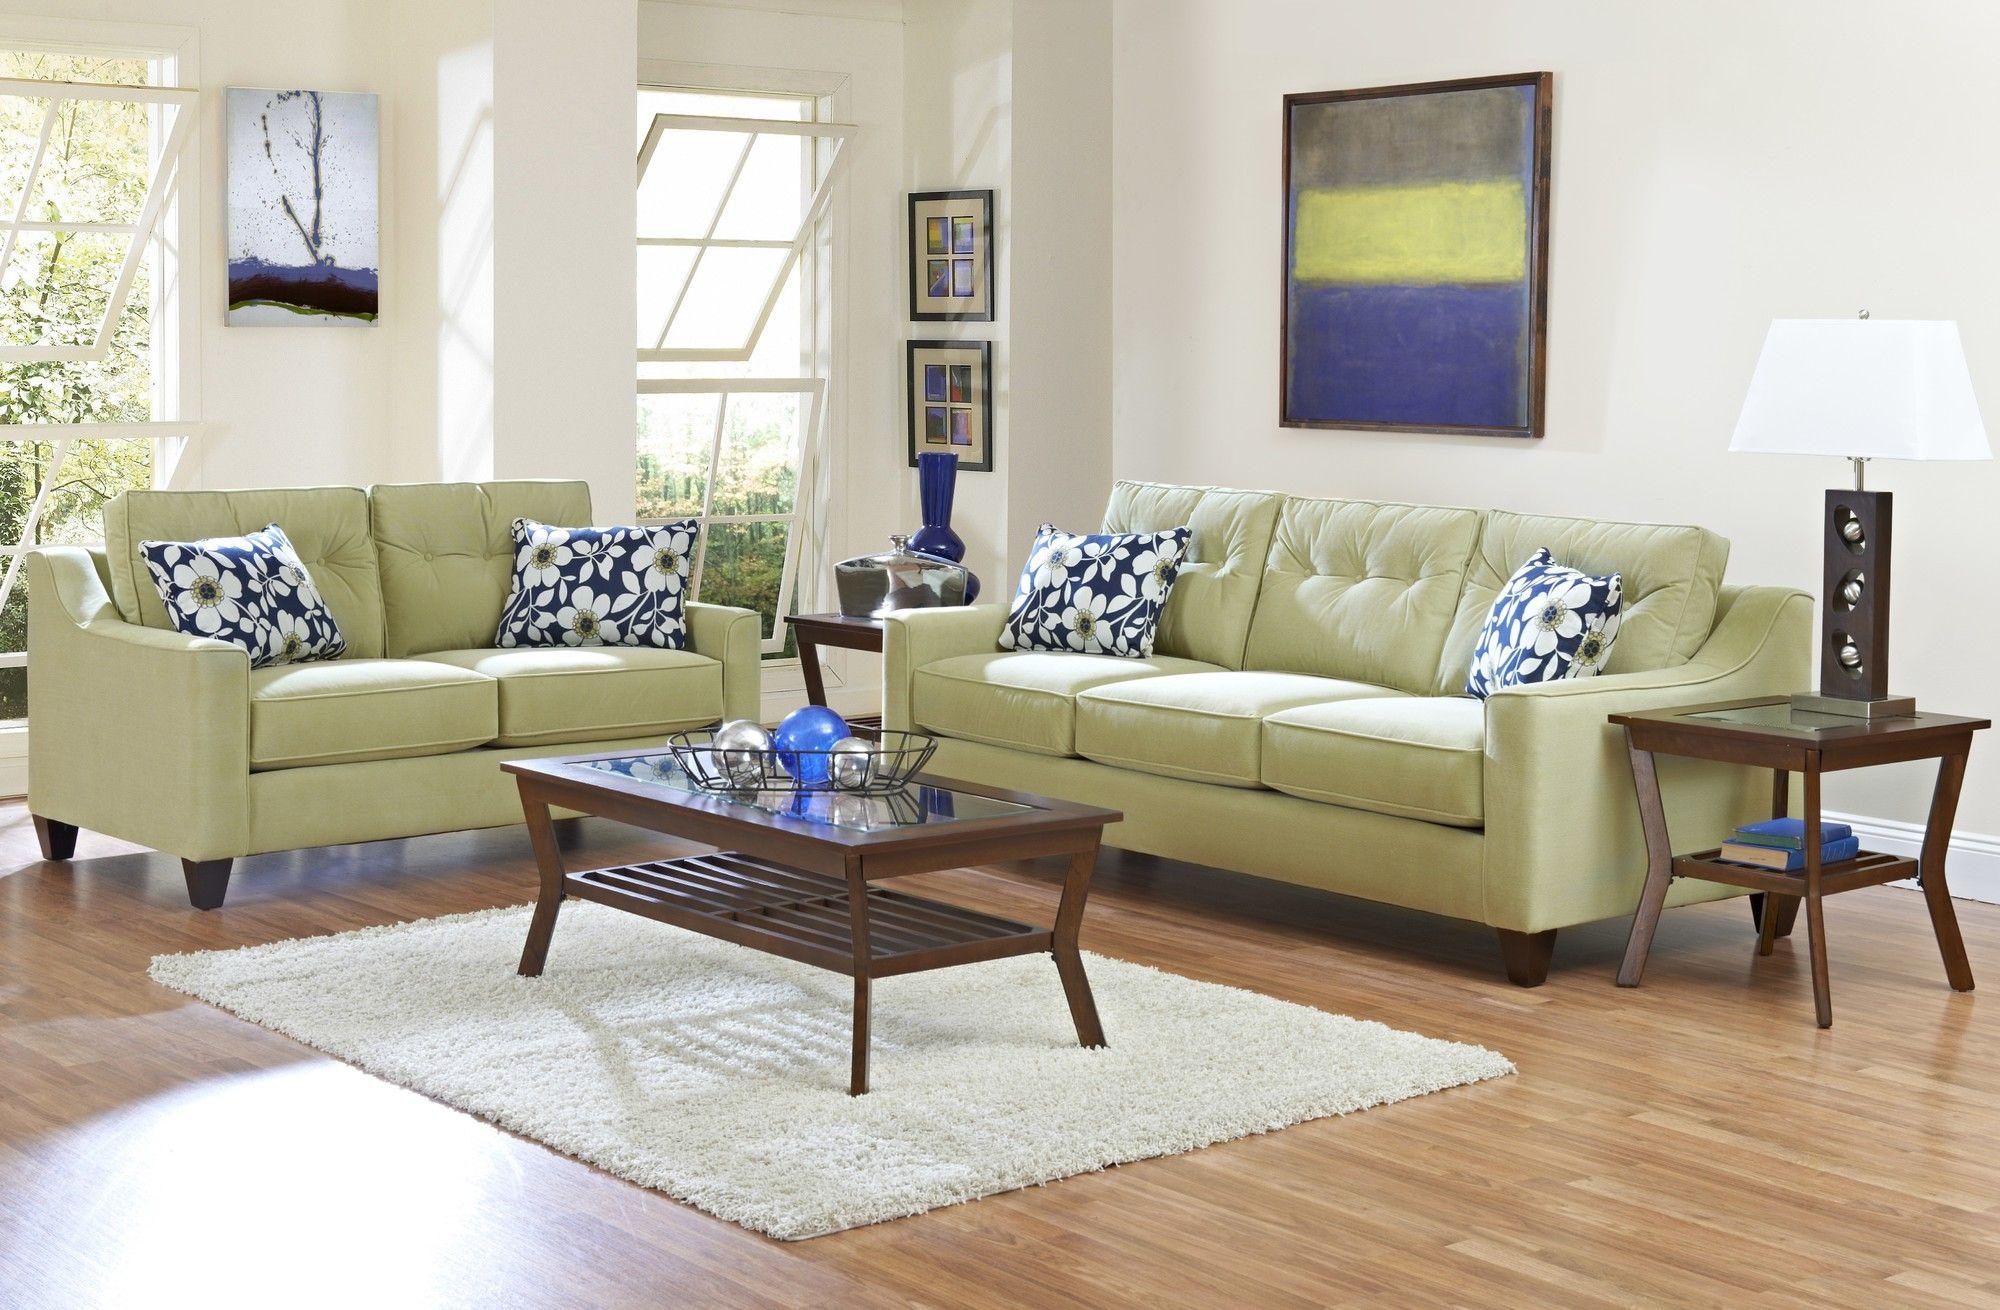 Klaussner Furniture Audrina Living Room Collection   Living room collections, Living room sets ...